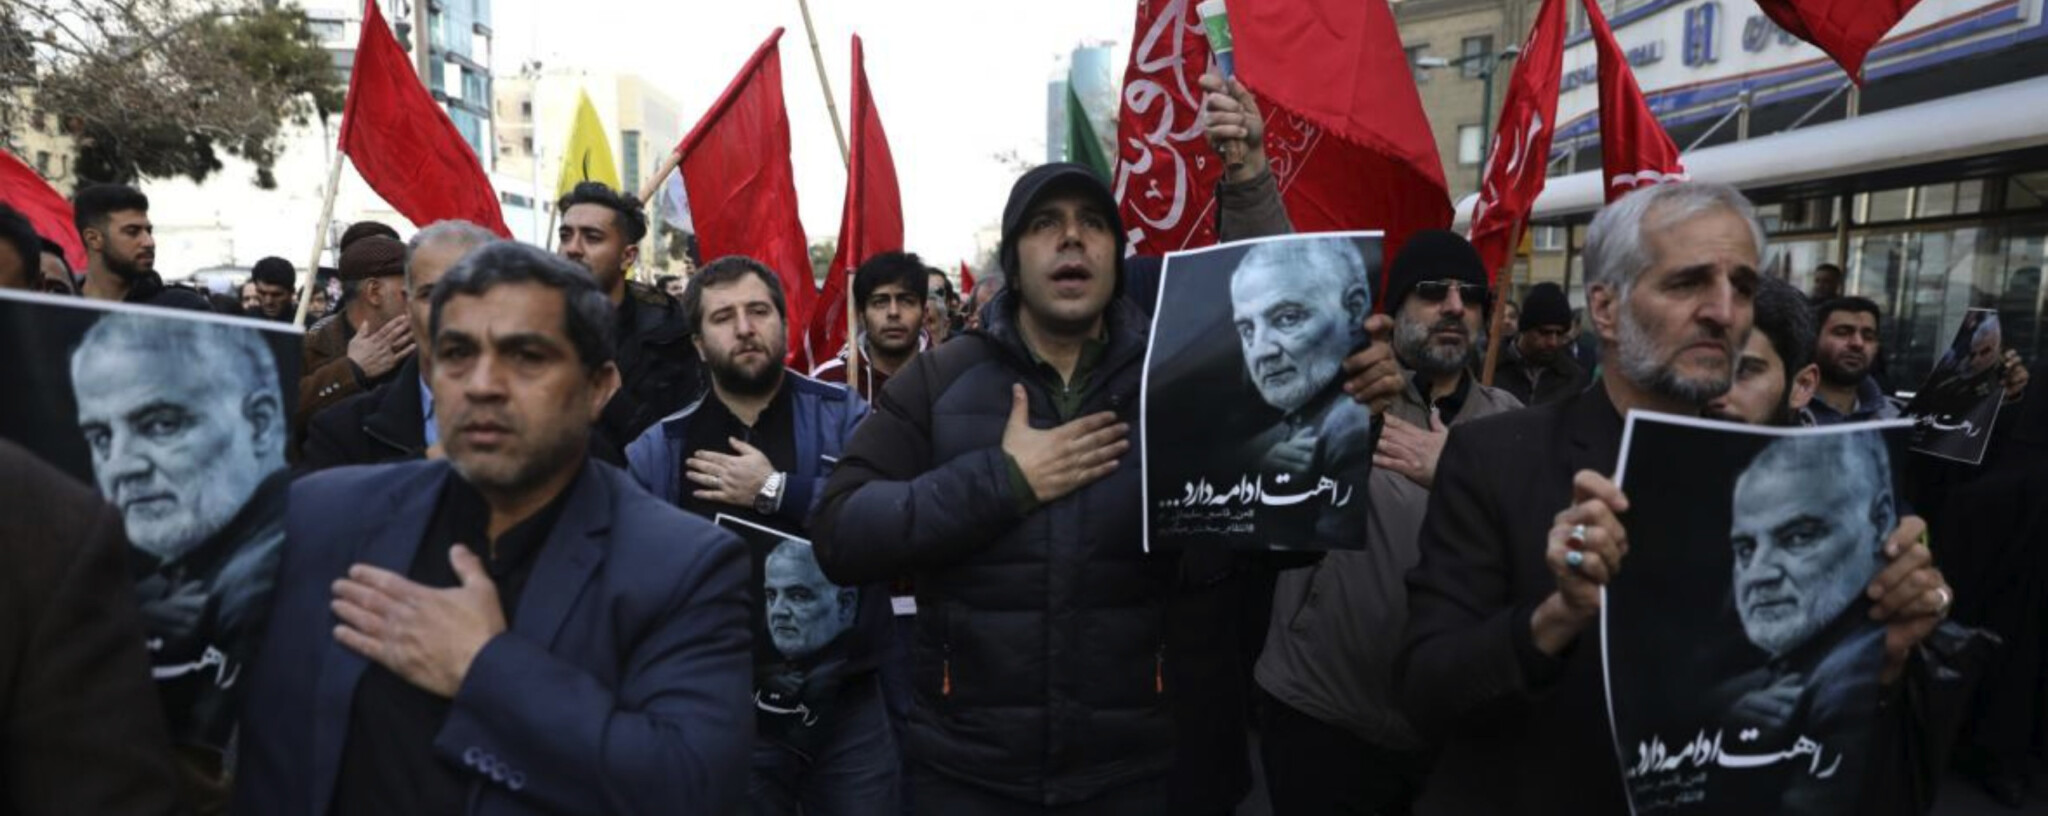 Motive and consequences of killing Qasem Soleimani